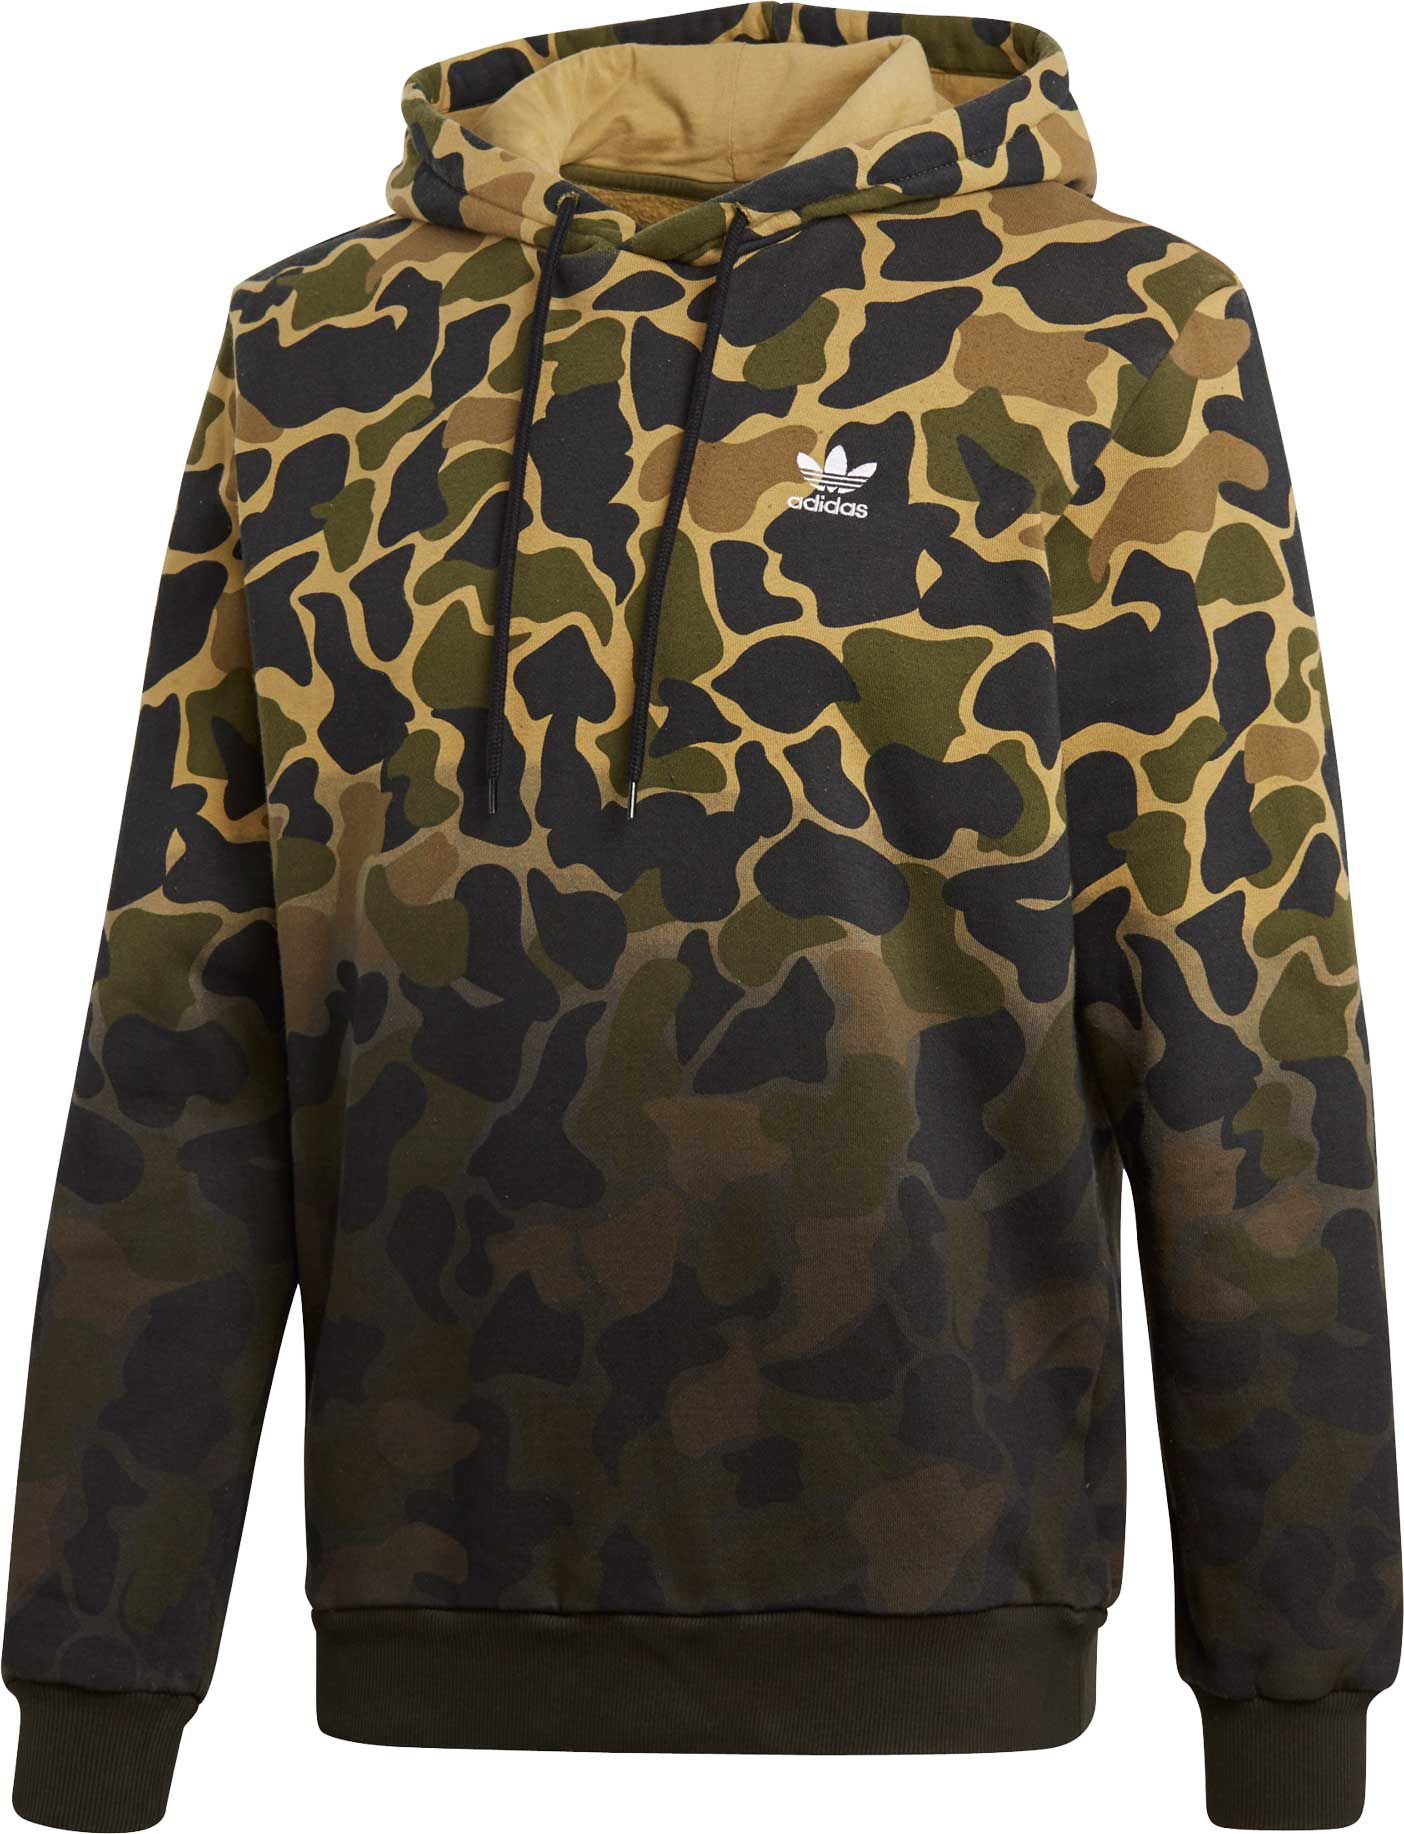 camo hoodie noimagefound ??? TOWERTJ